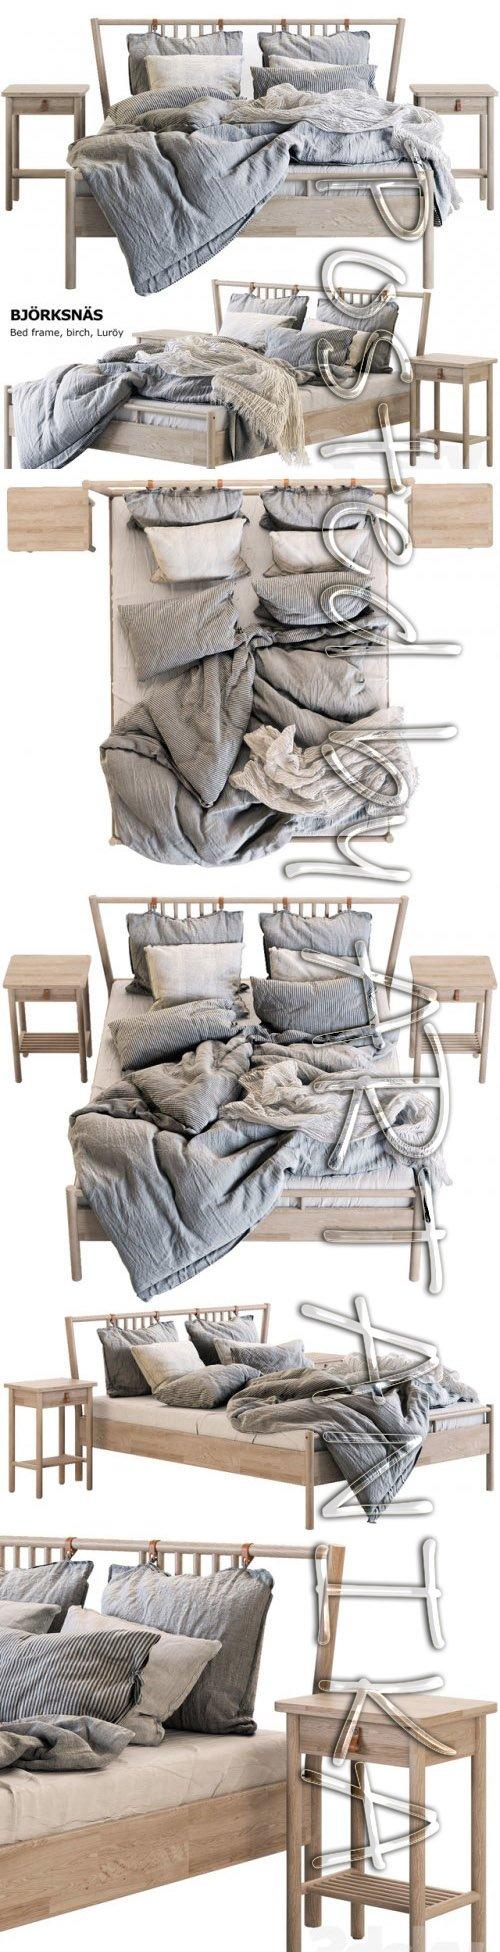 Bed BJORKSNAS Ikea / Ikea 3D model